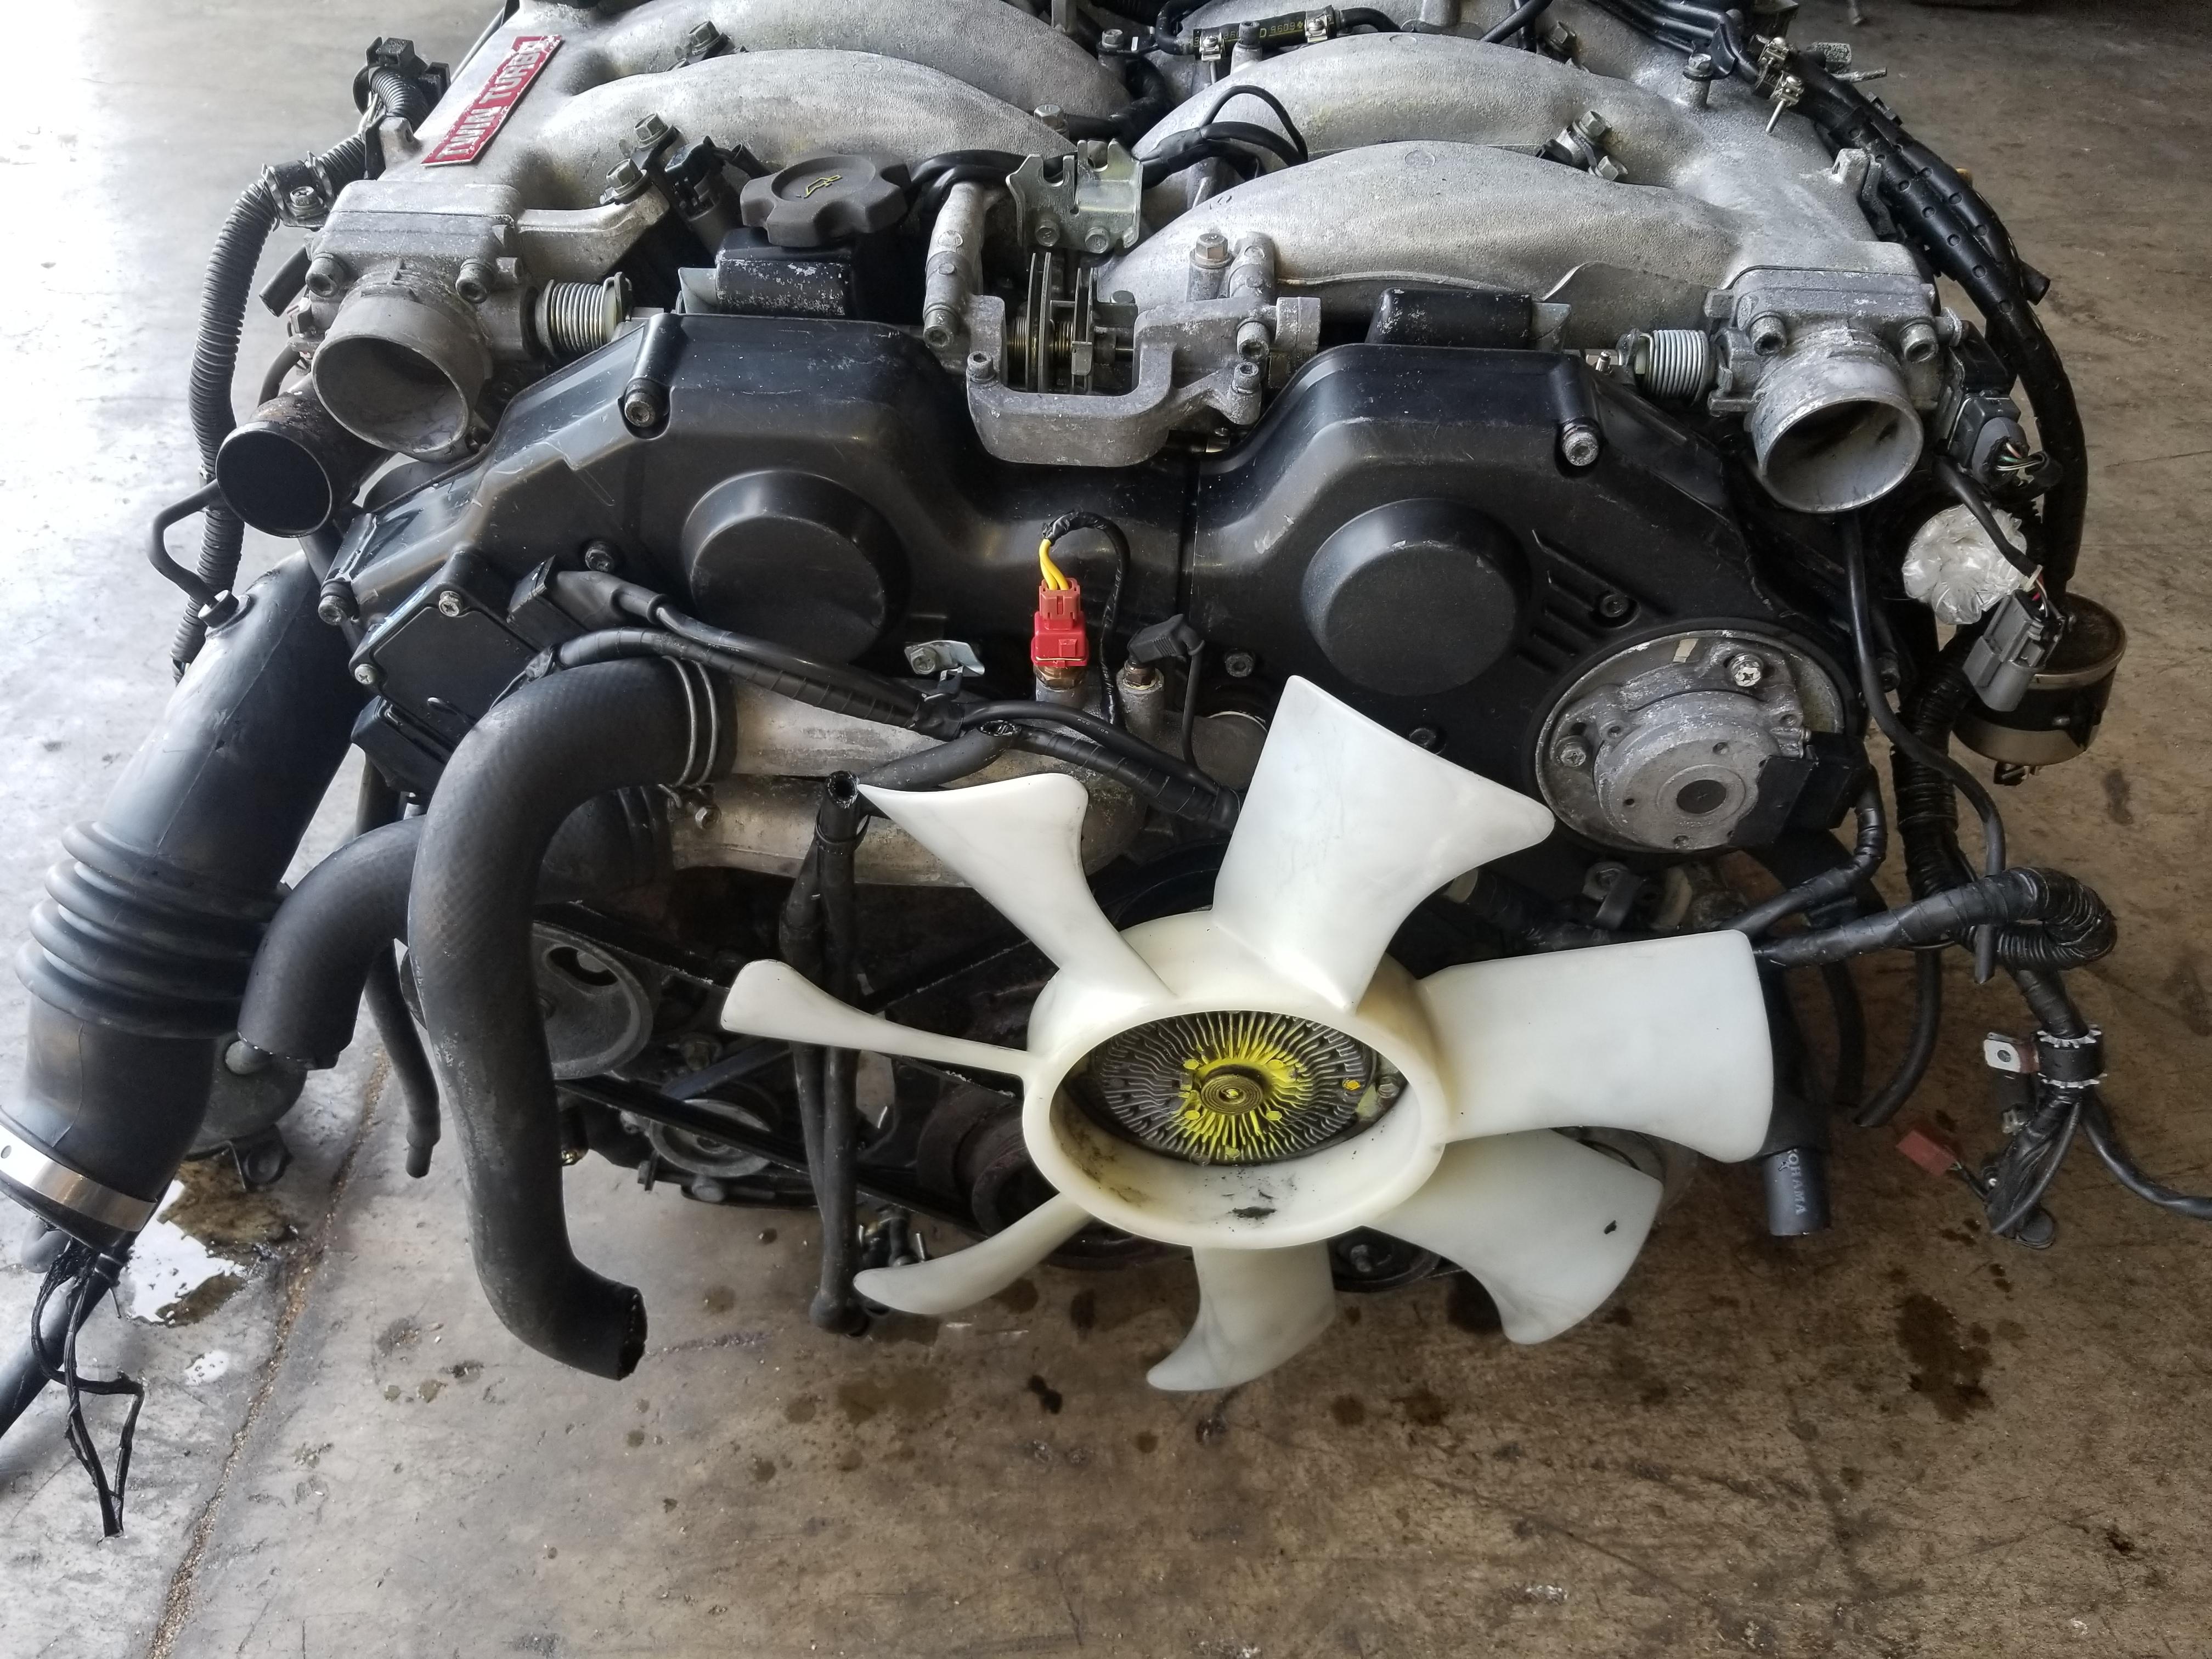 Nissan Chula Vista >> VG30DETT 1990 1996 NISSAN 300ZX Z32 TWIN TURBO 3.0 V6 JDM VG30DETT ENGINE With Automatic ...